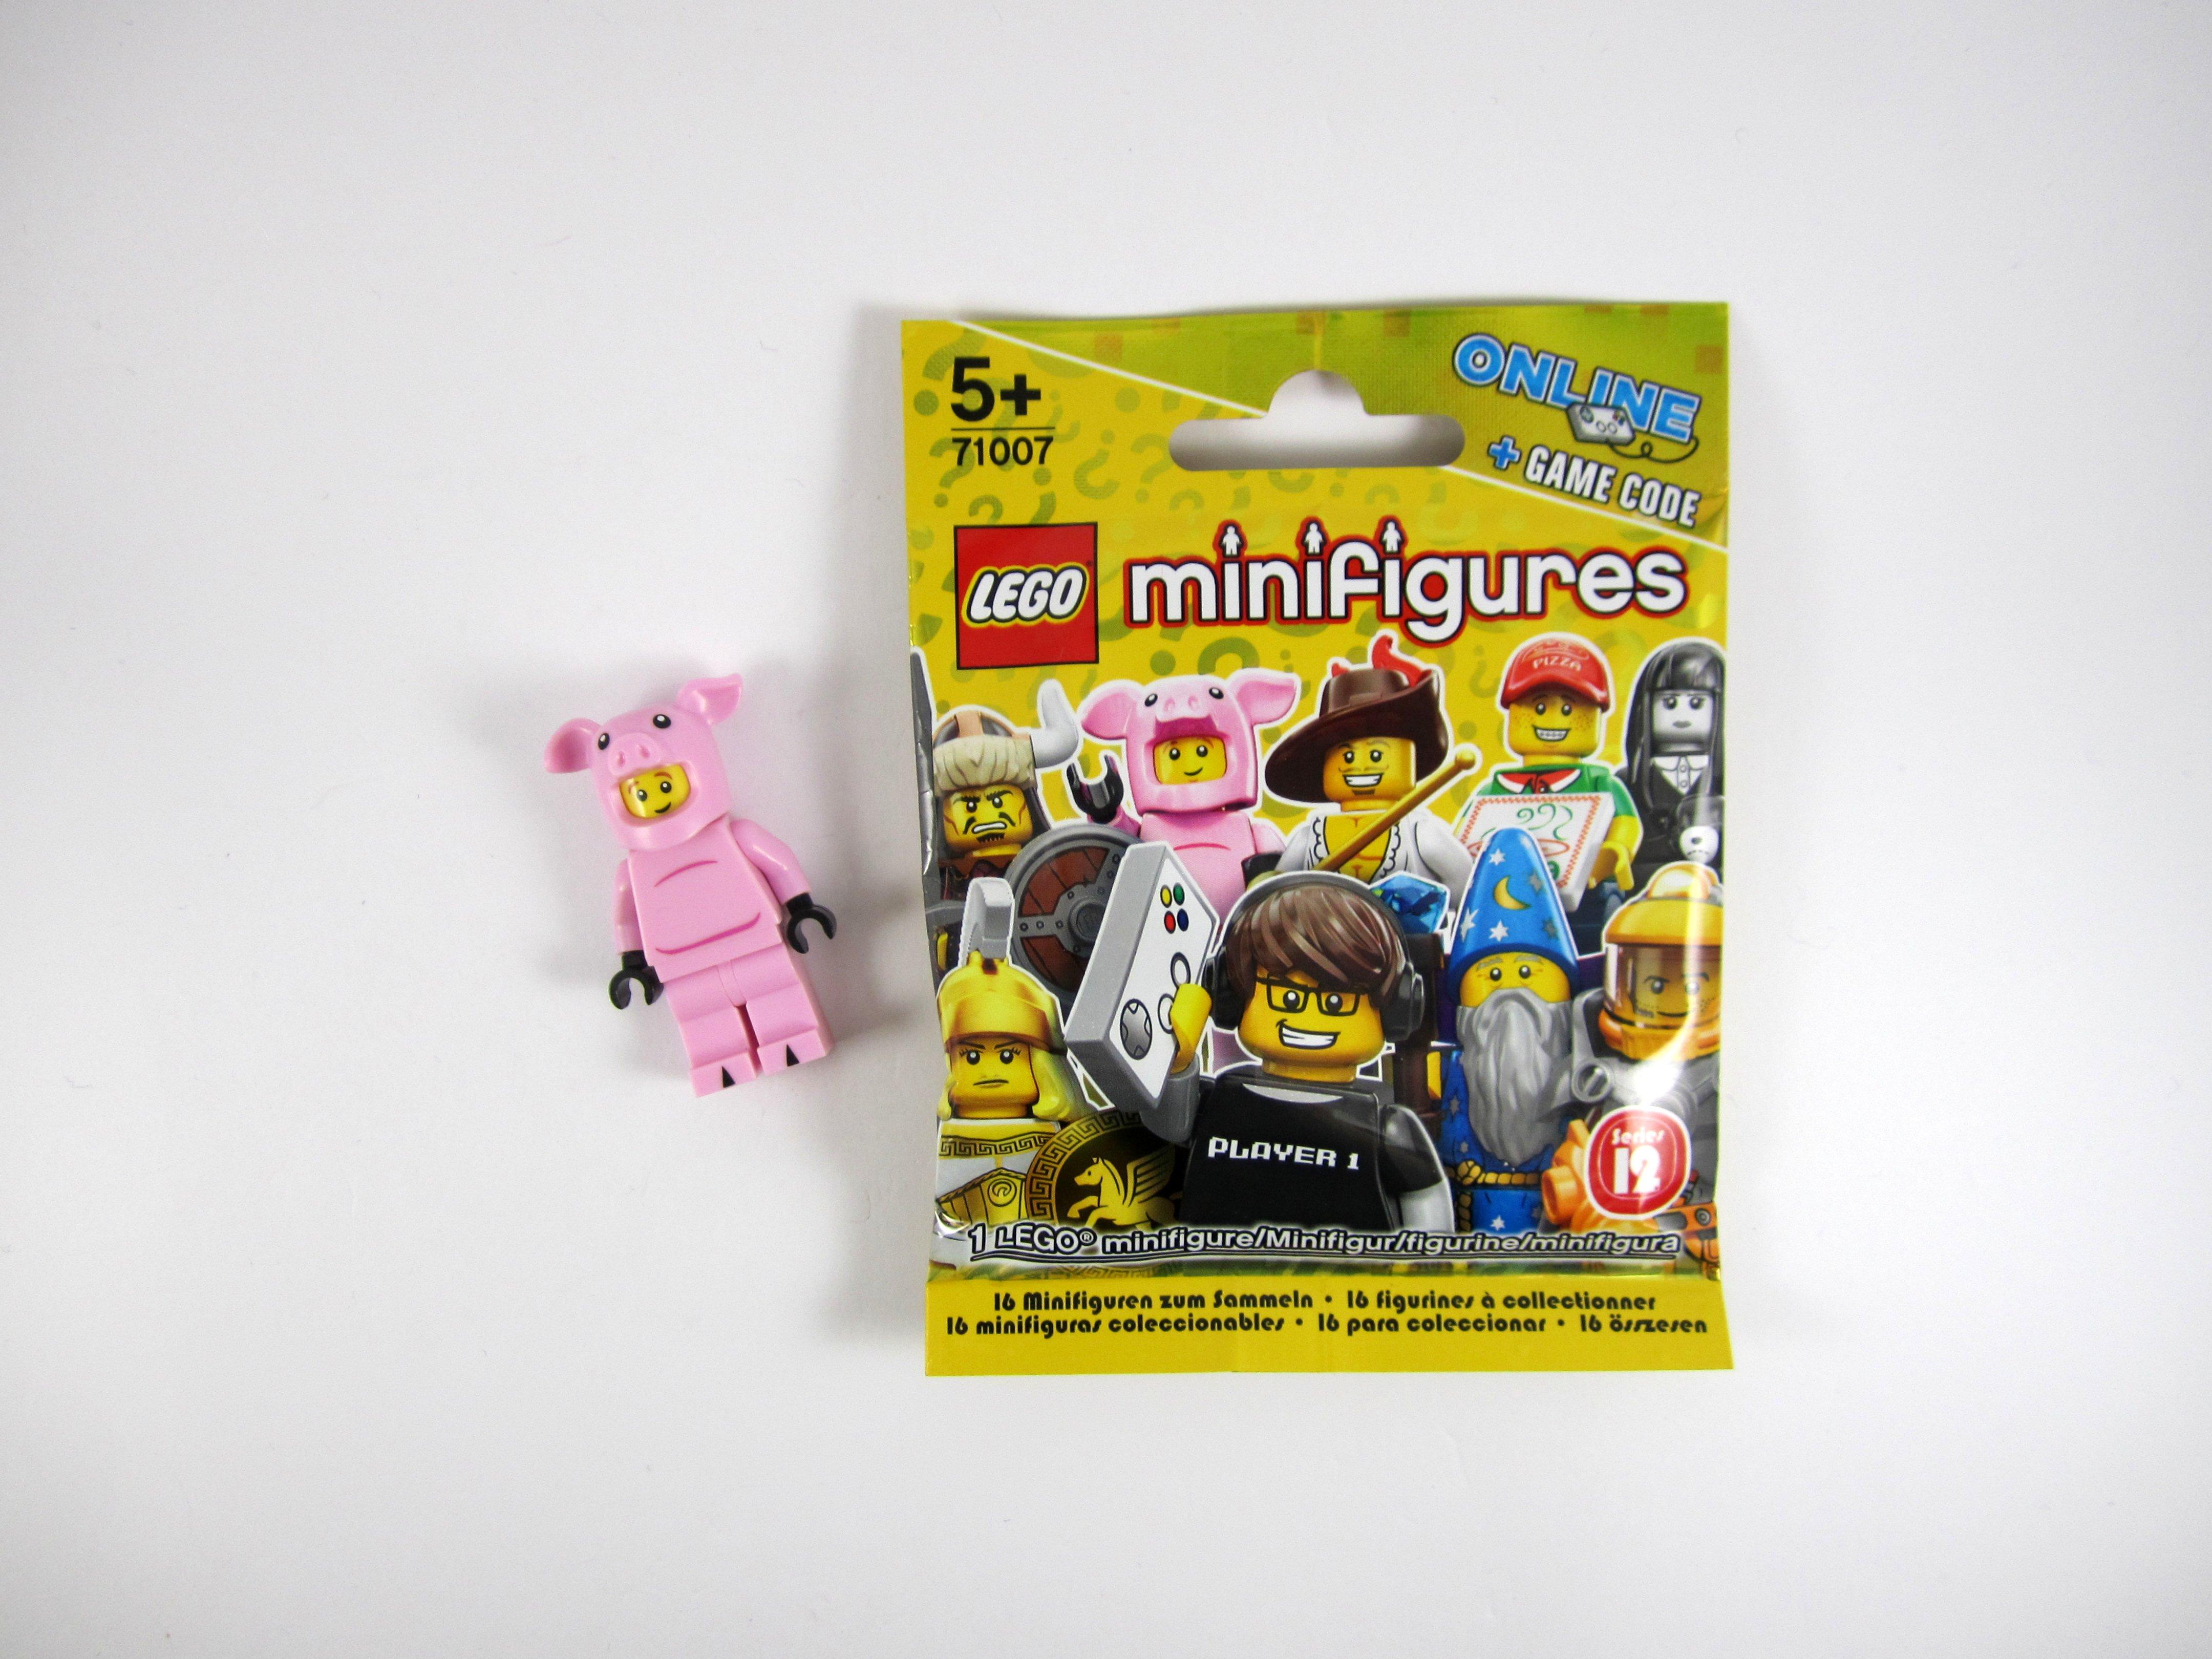 minis series woody blind story fan packs the toy blinds mattel dan pixar